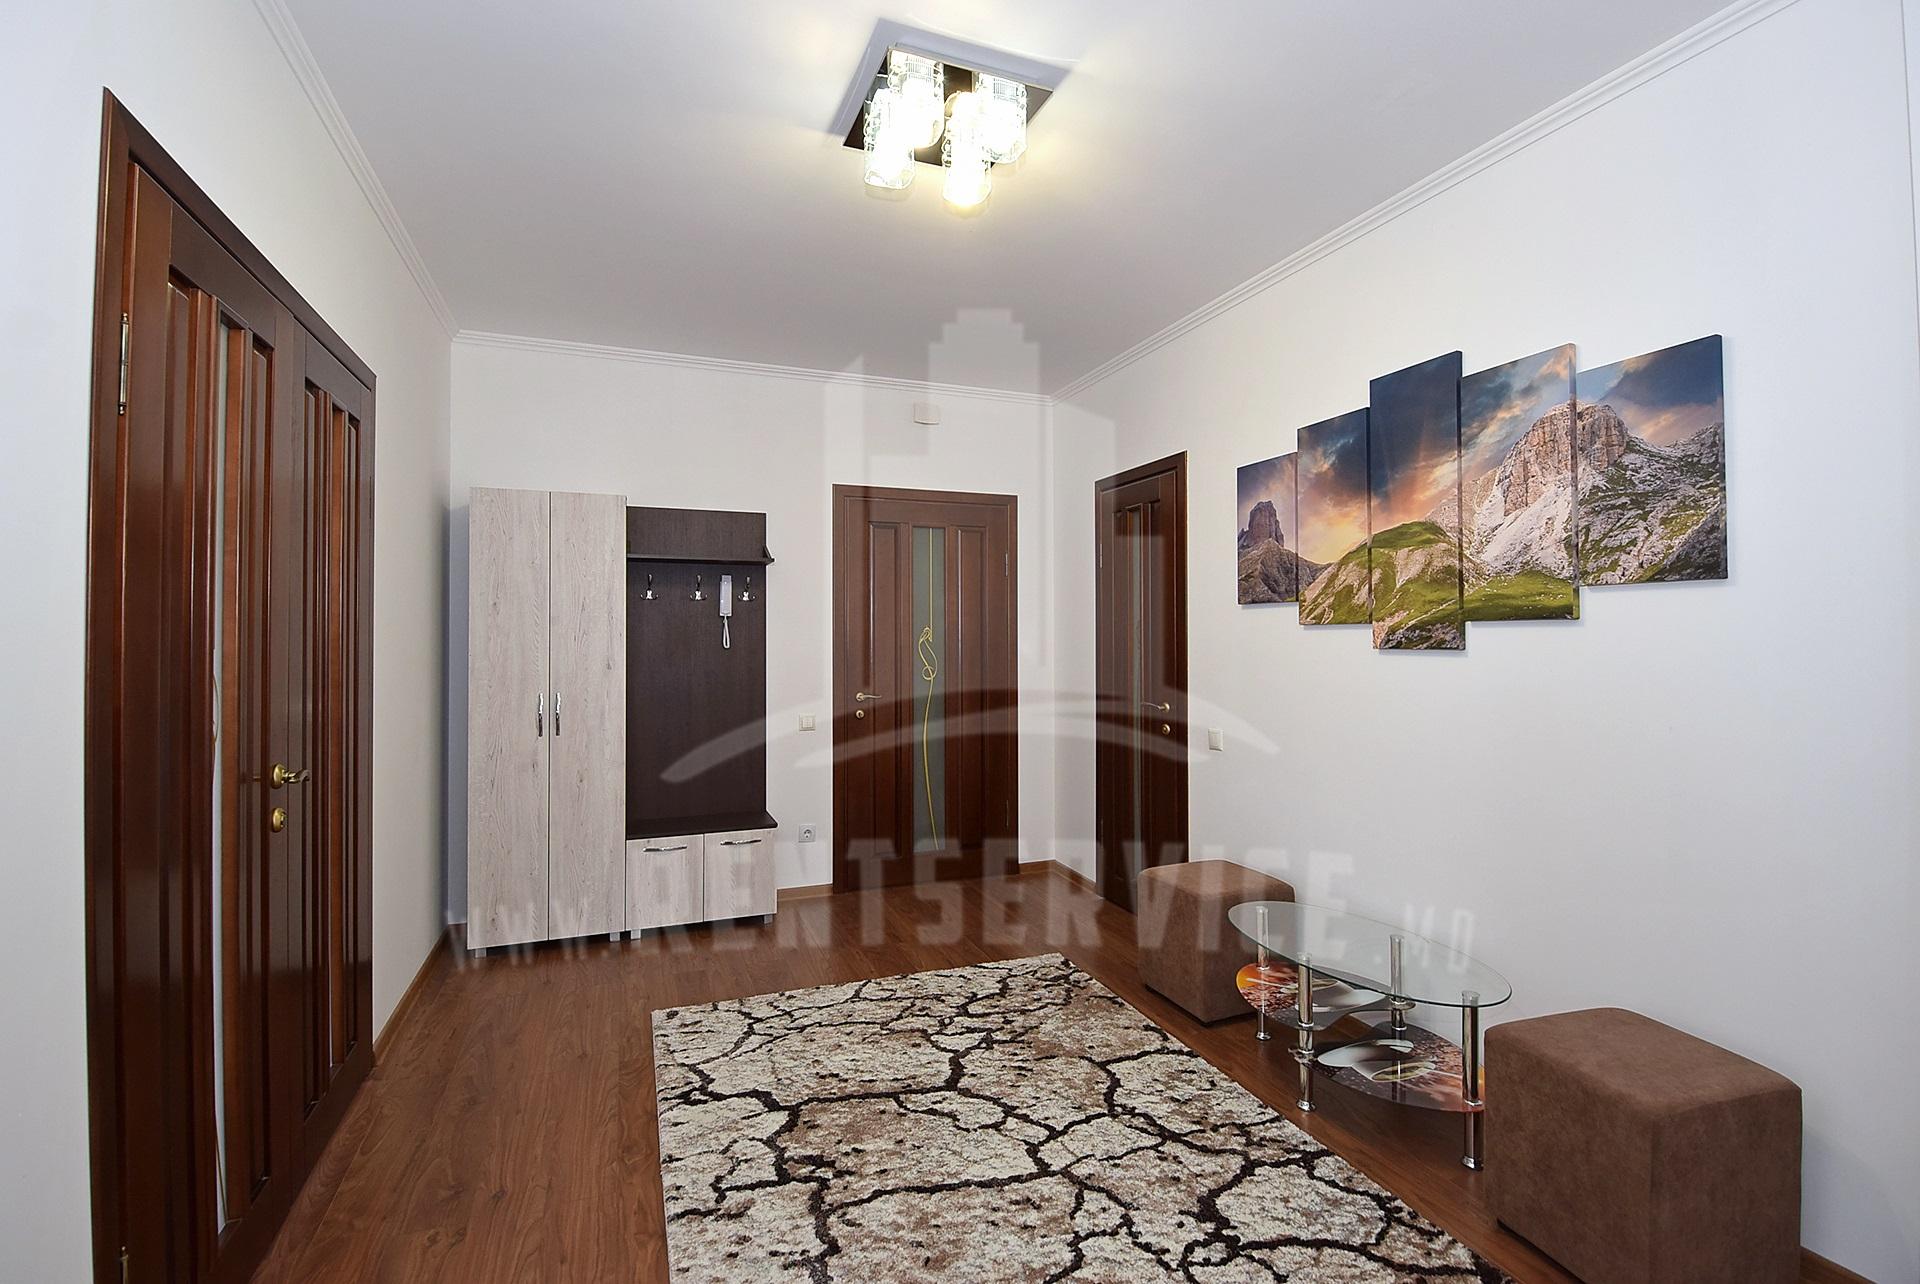 287_apartment_8.JPG